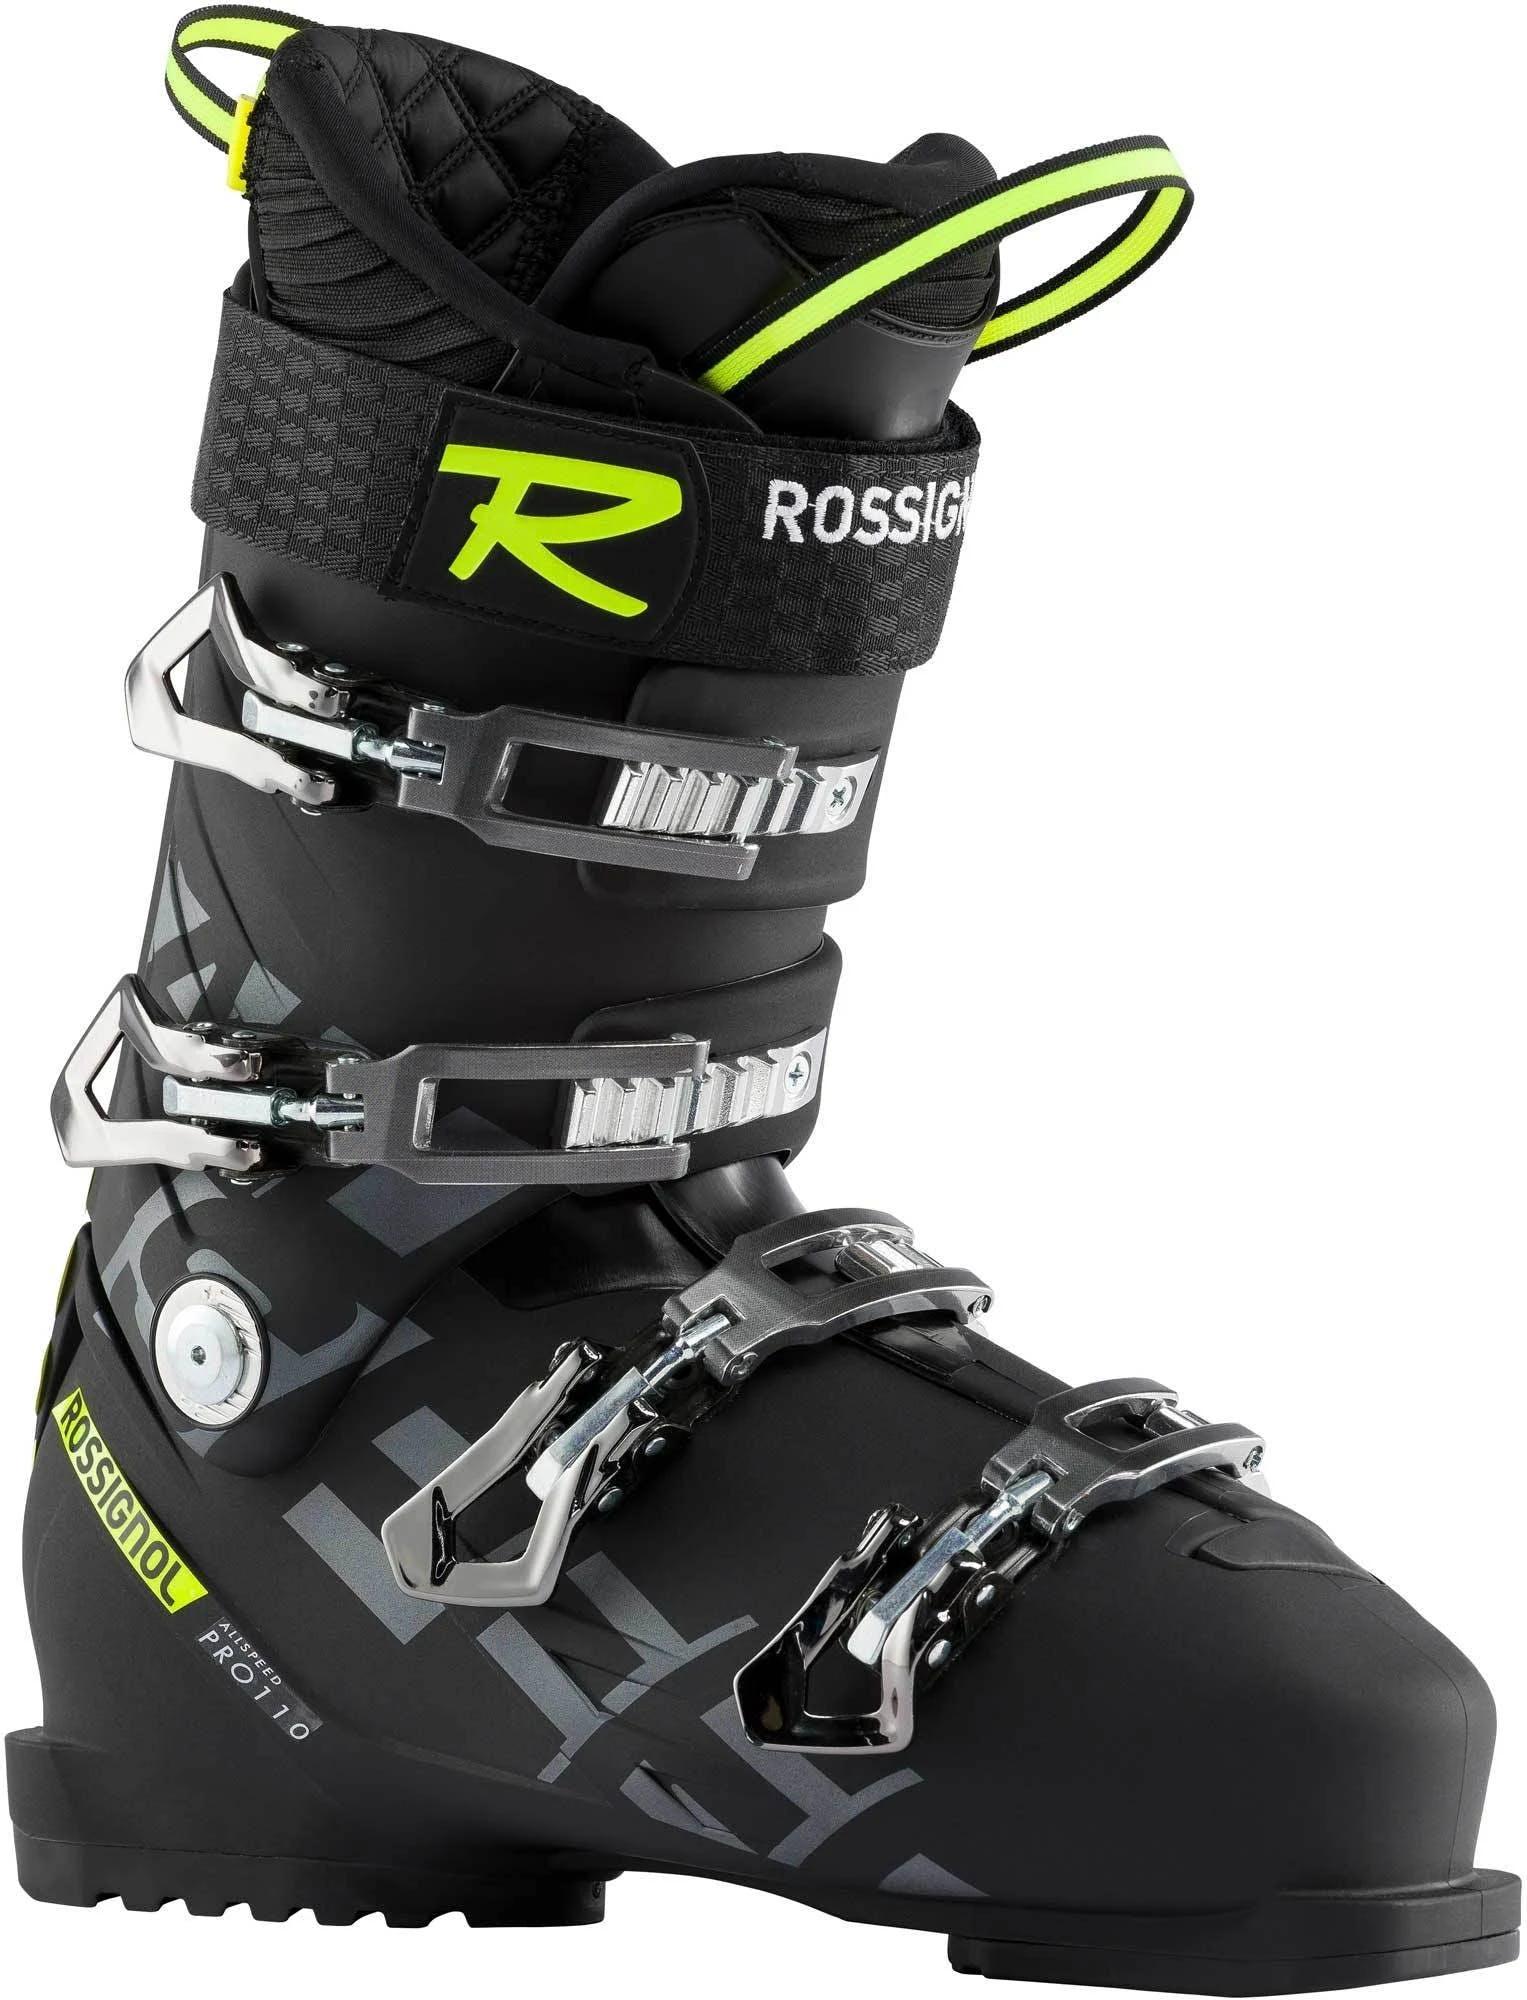 Rossignol Allspeed Pro 110 Ski Boots  27.5 · 2021